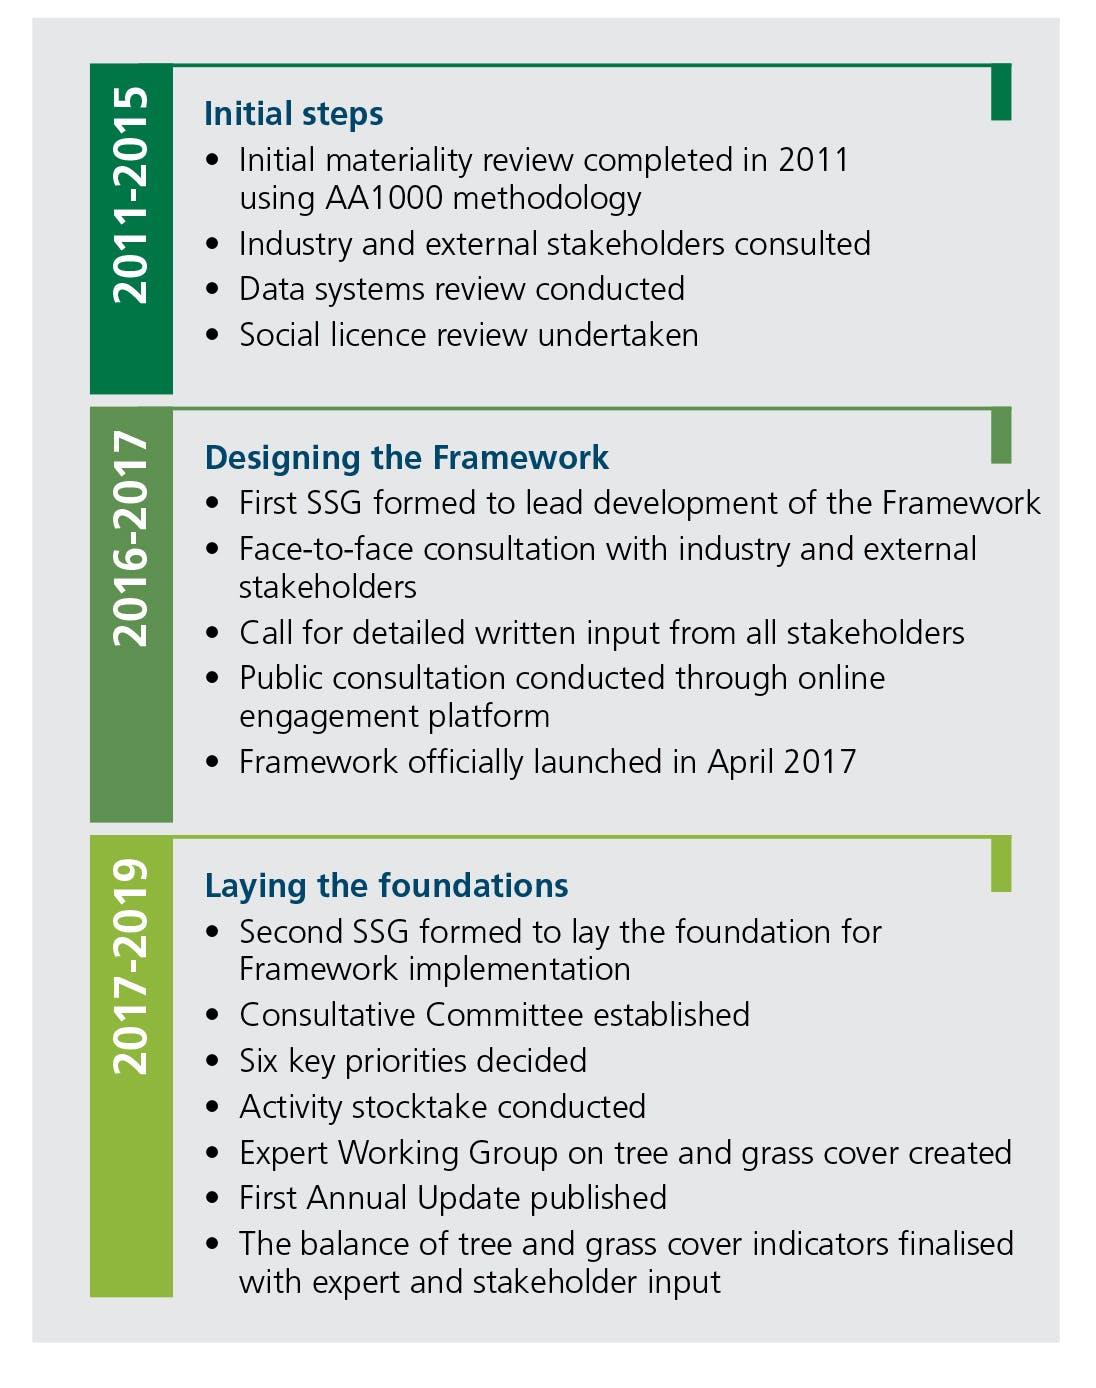 2011-2021 progress